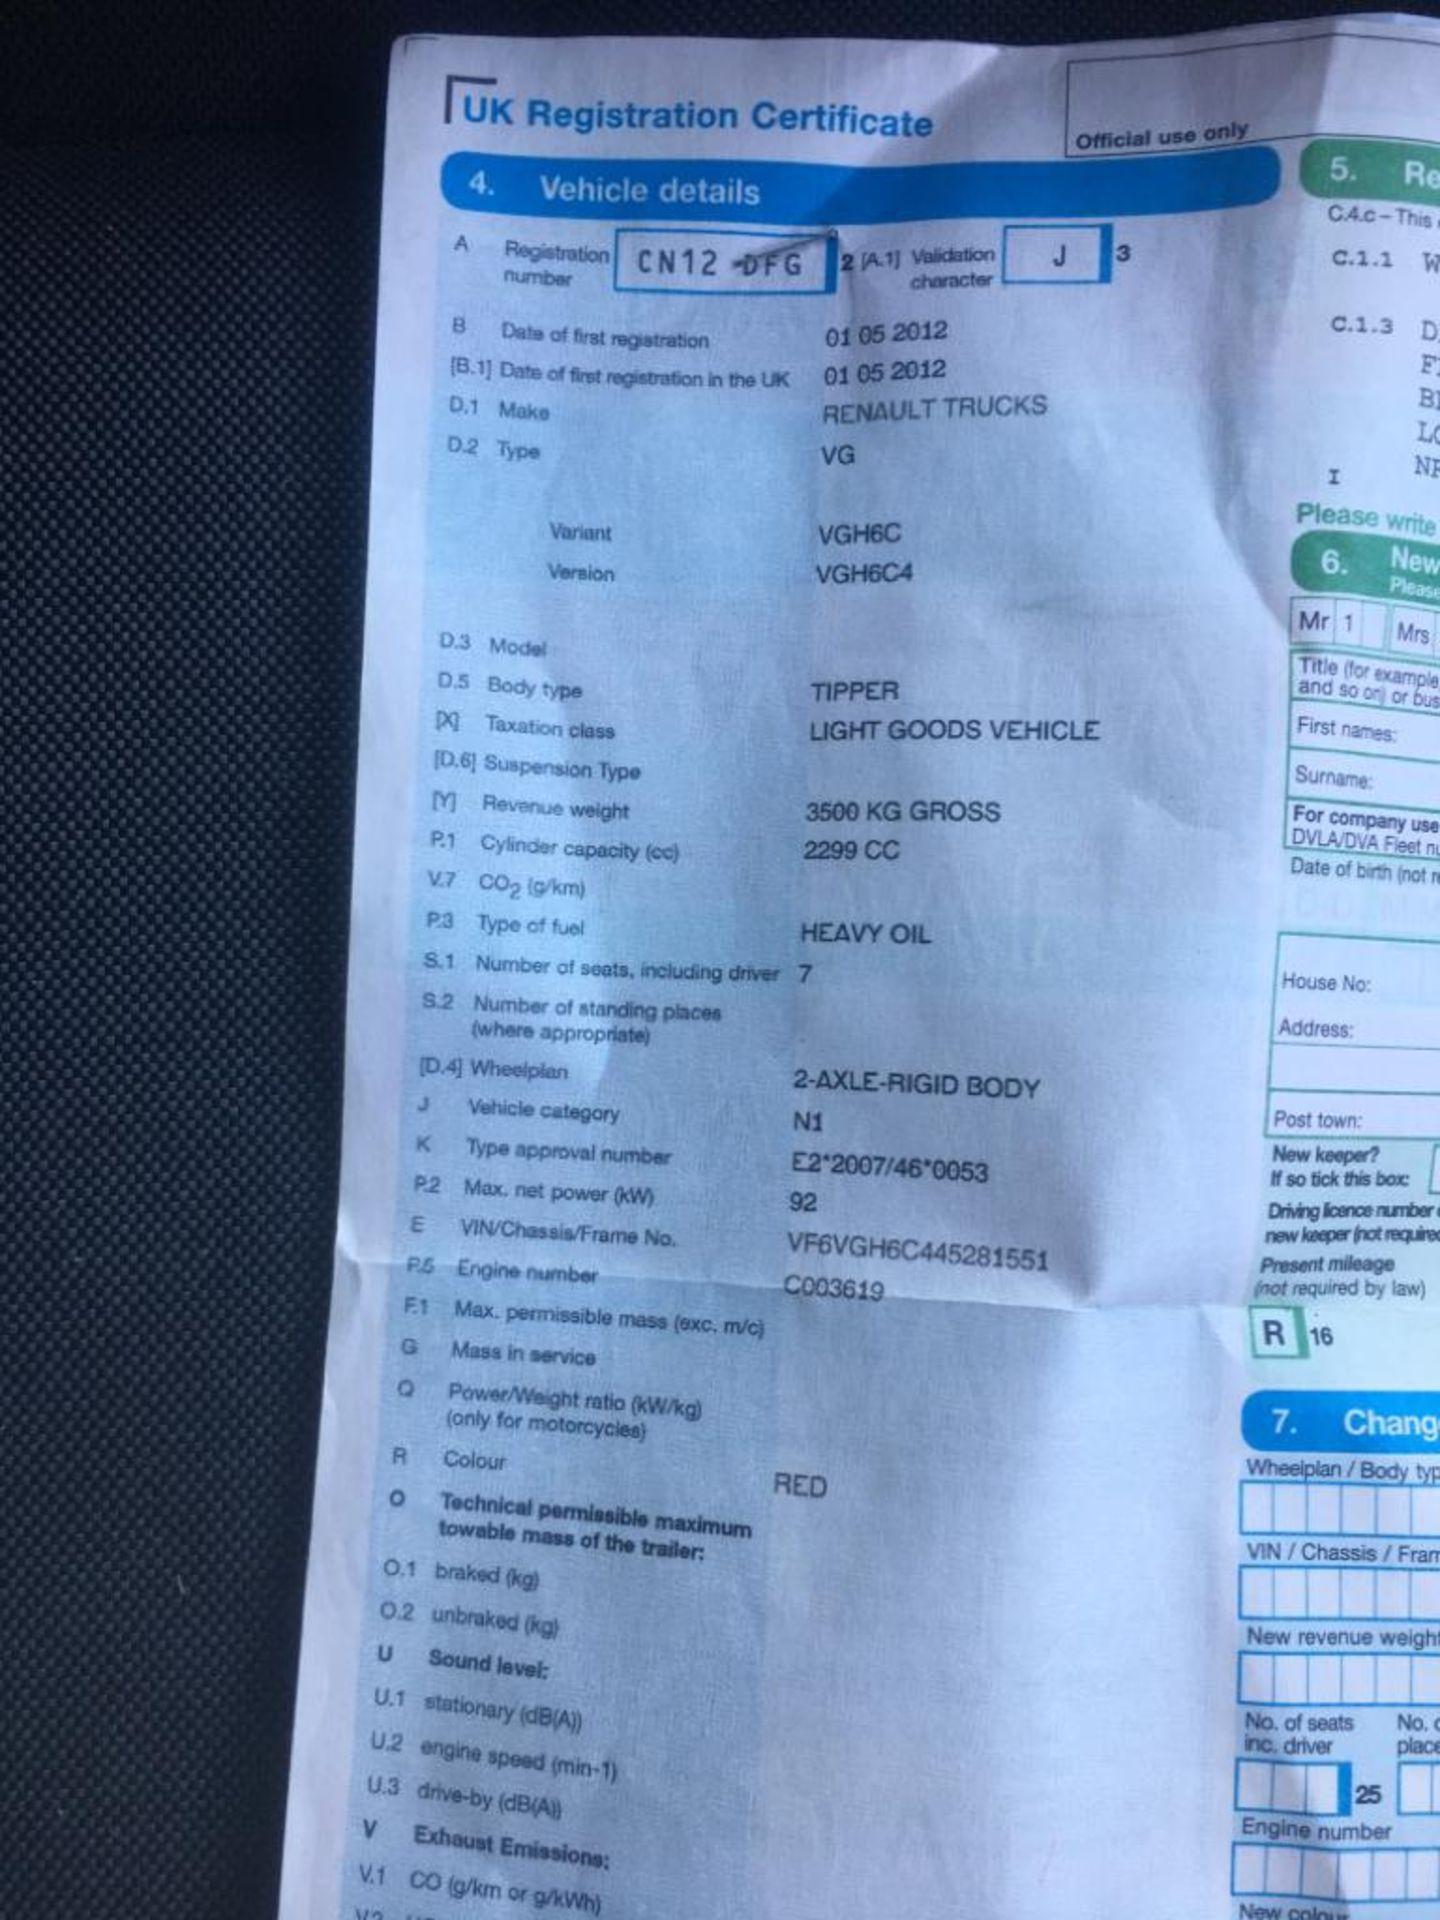 Lot 4 - 2012 RENAULT TRUCKS TIPPER 2.3 DOUBLE CAB